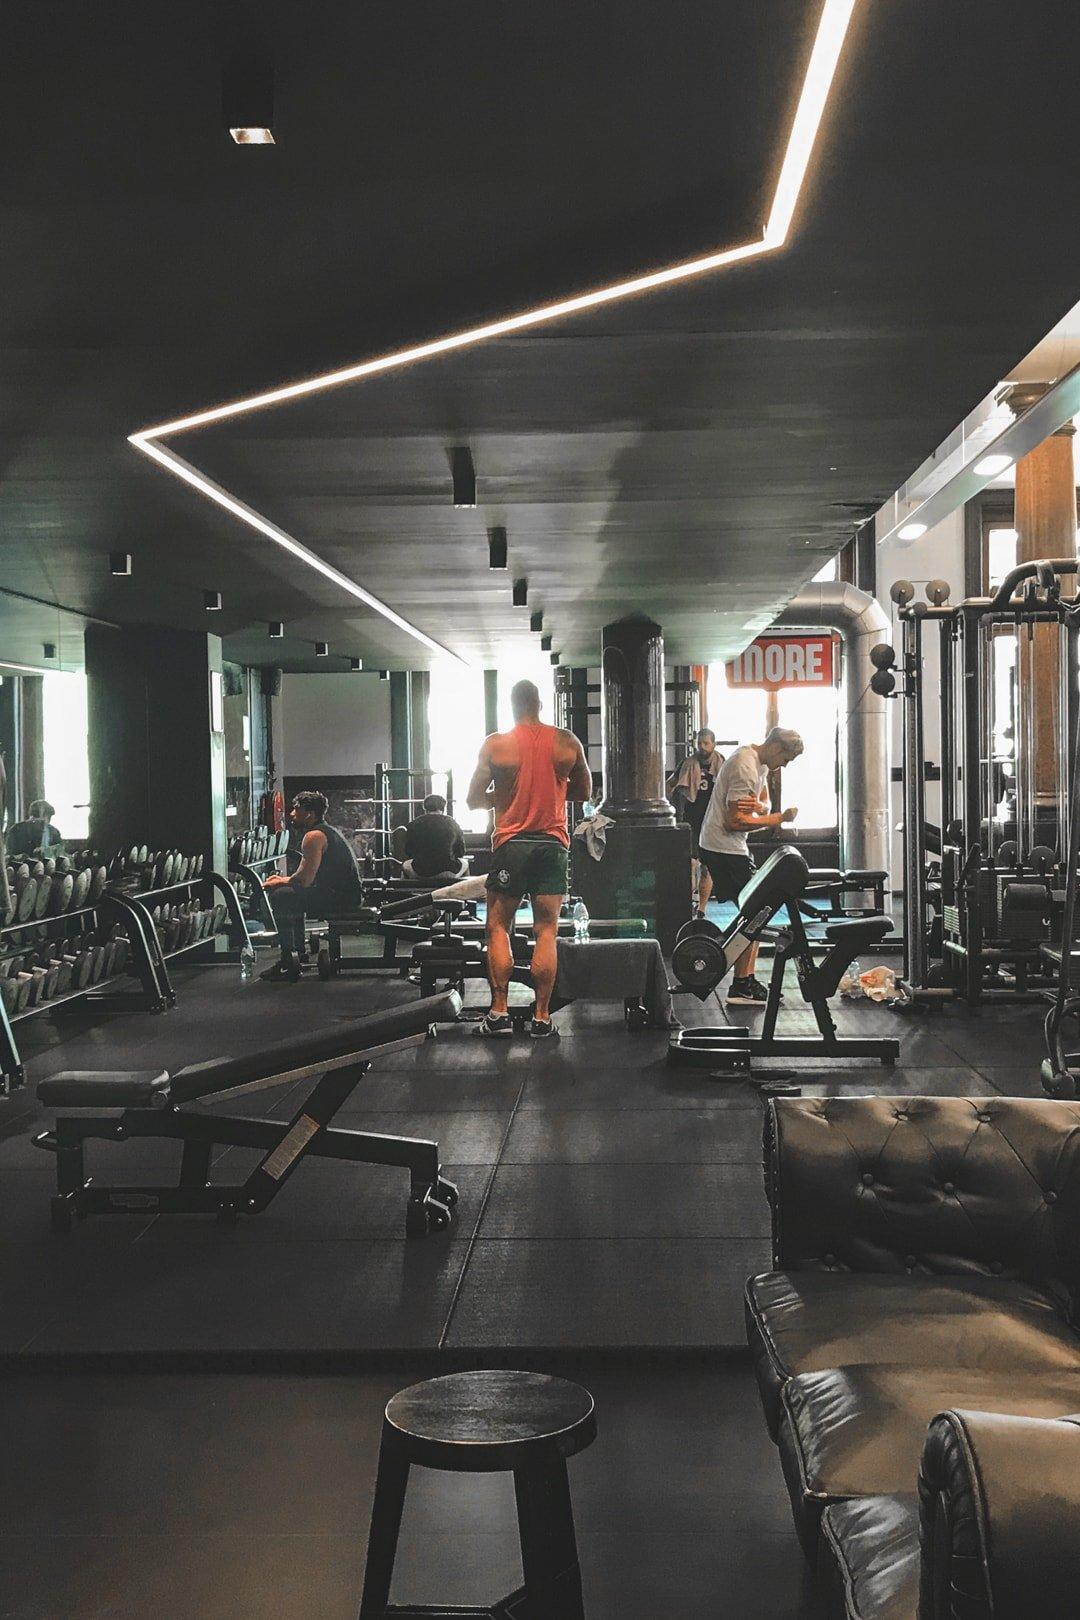 singlar gym)